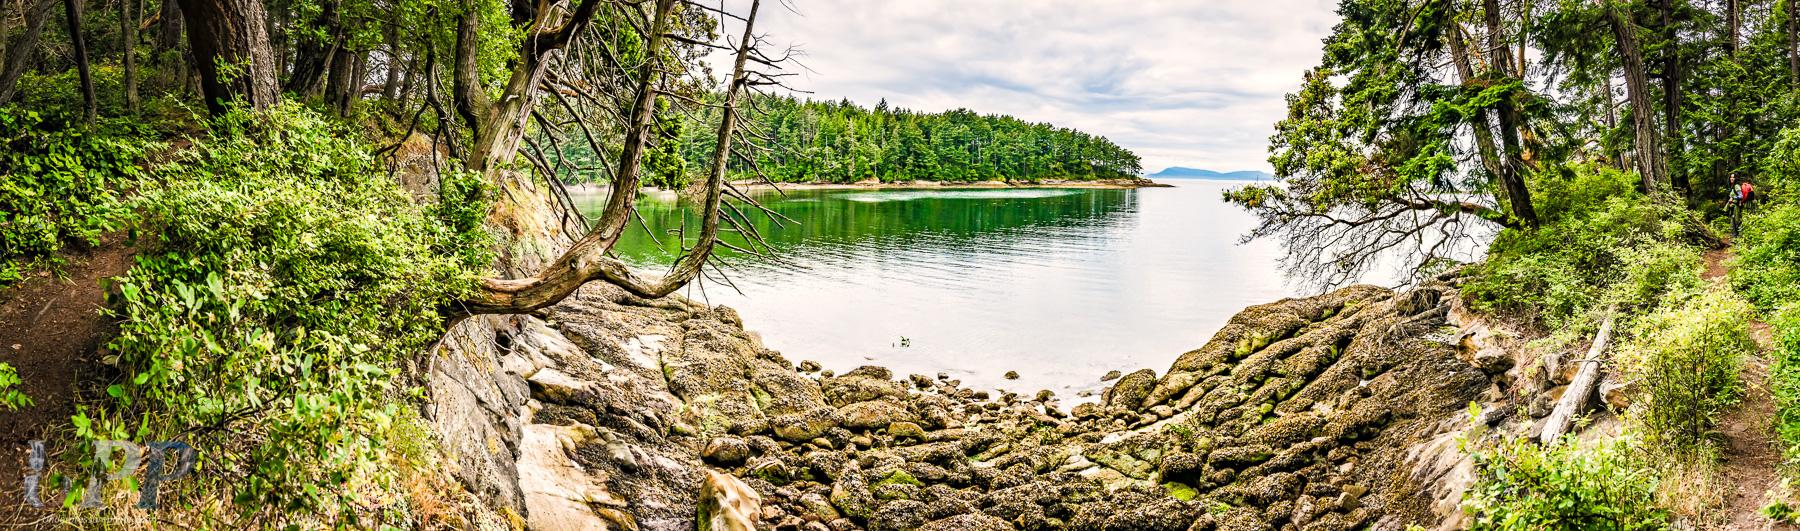 Shallow Bay on Sucia Island, WA.